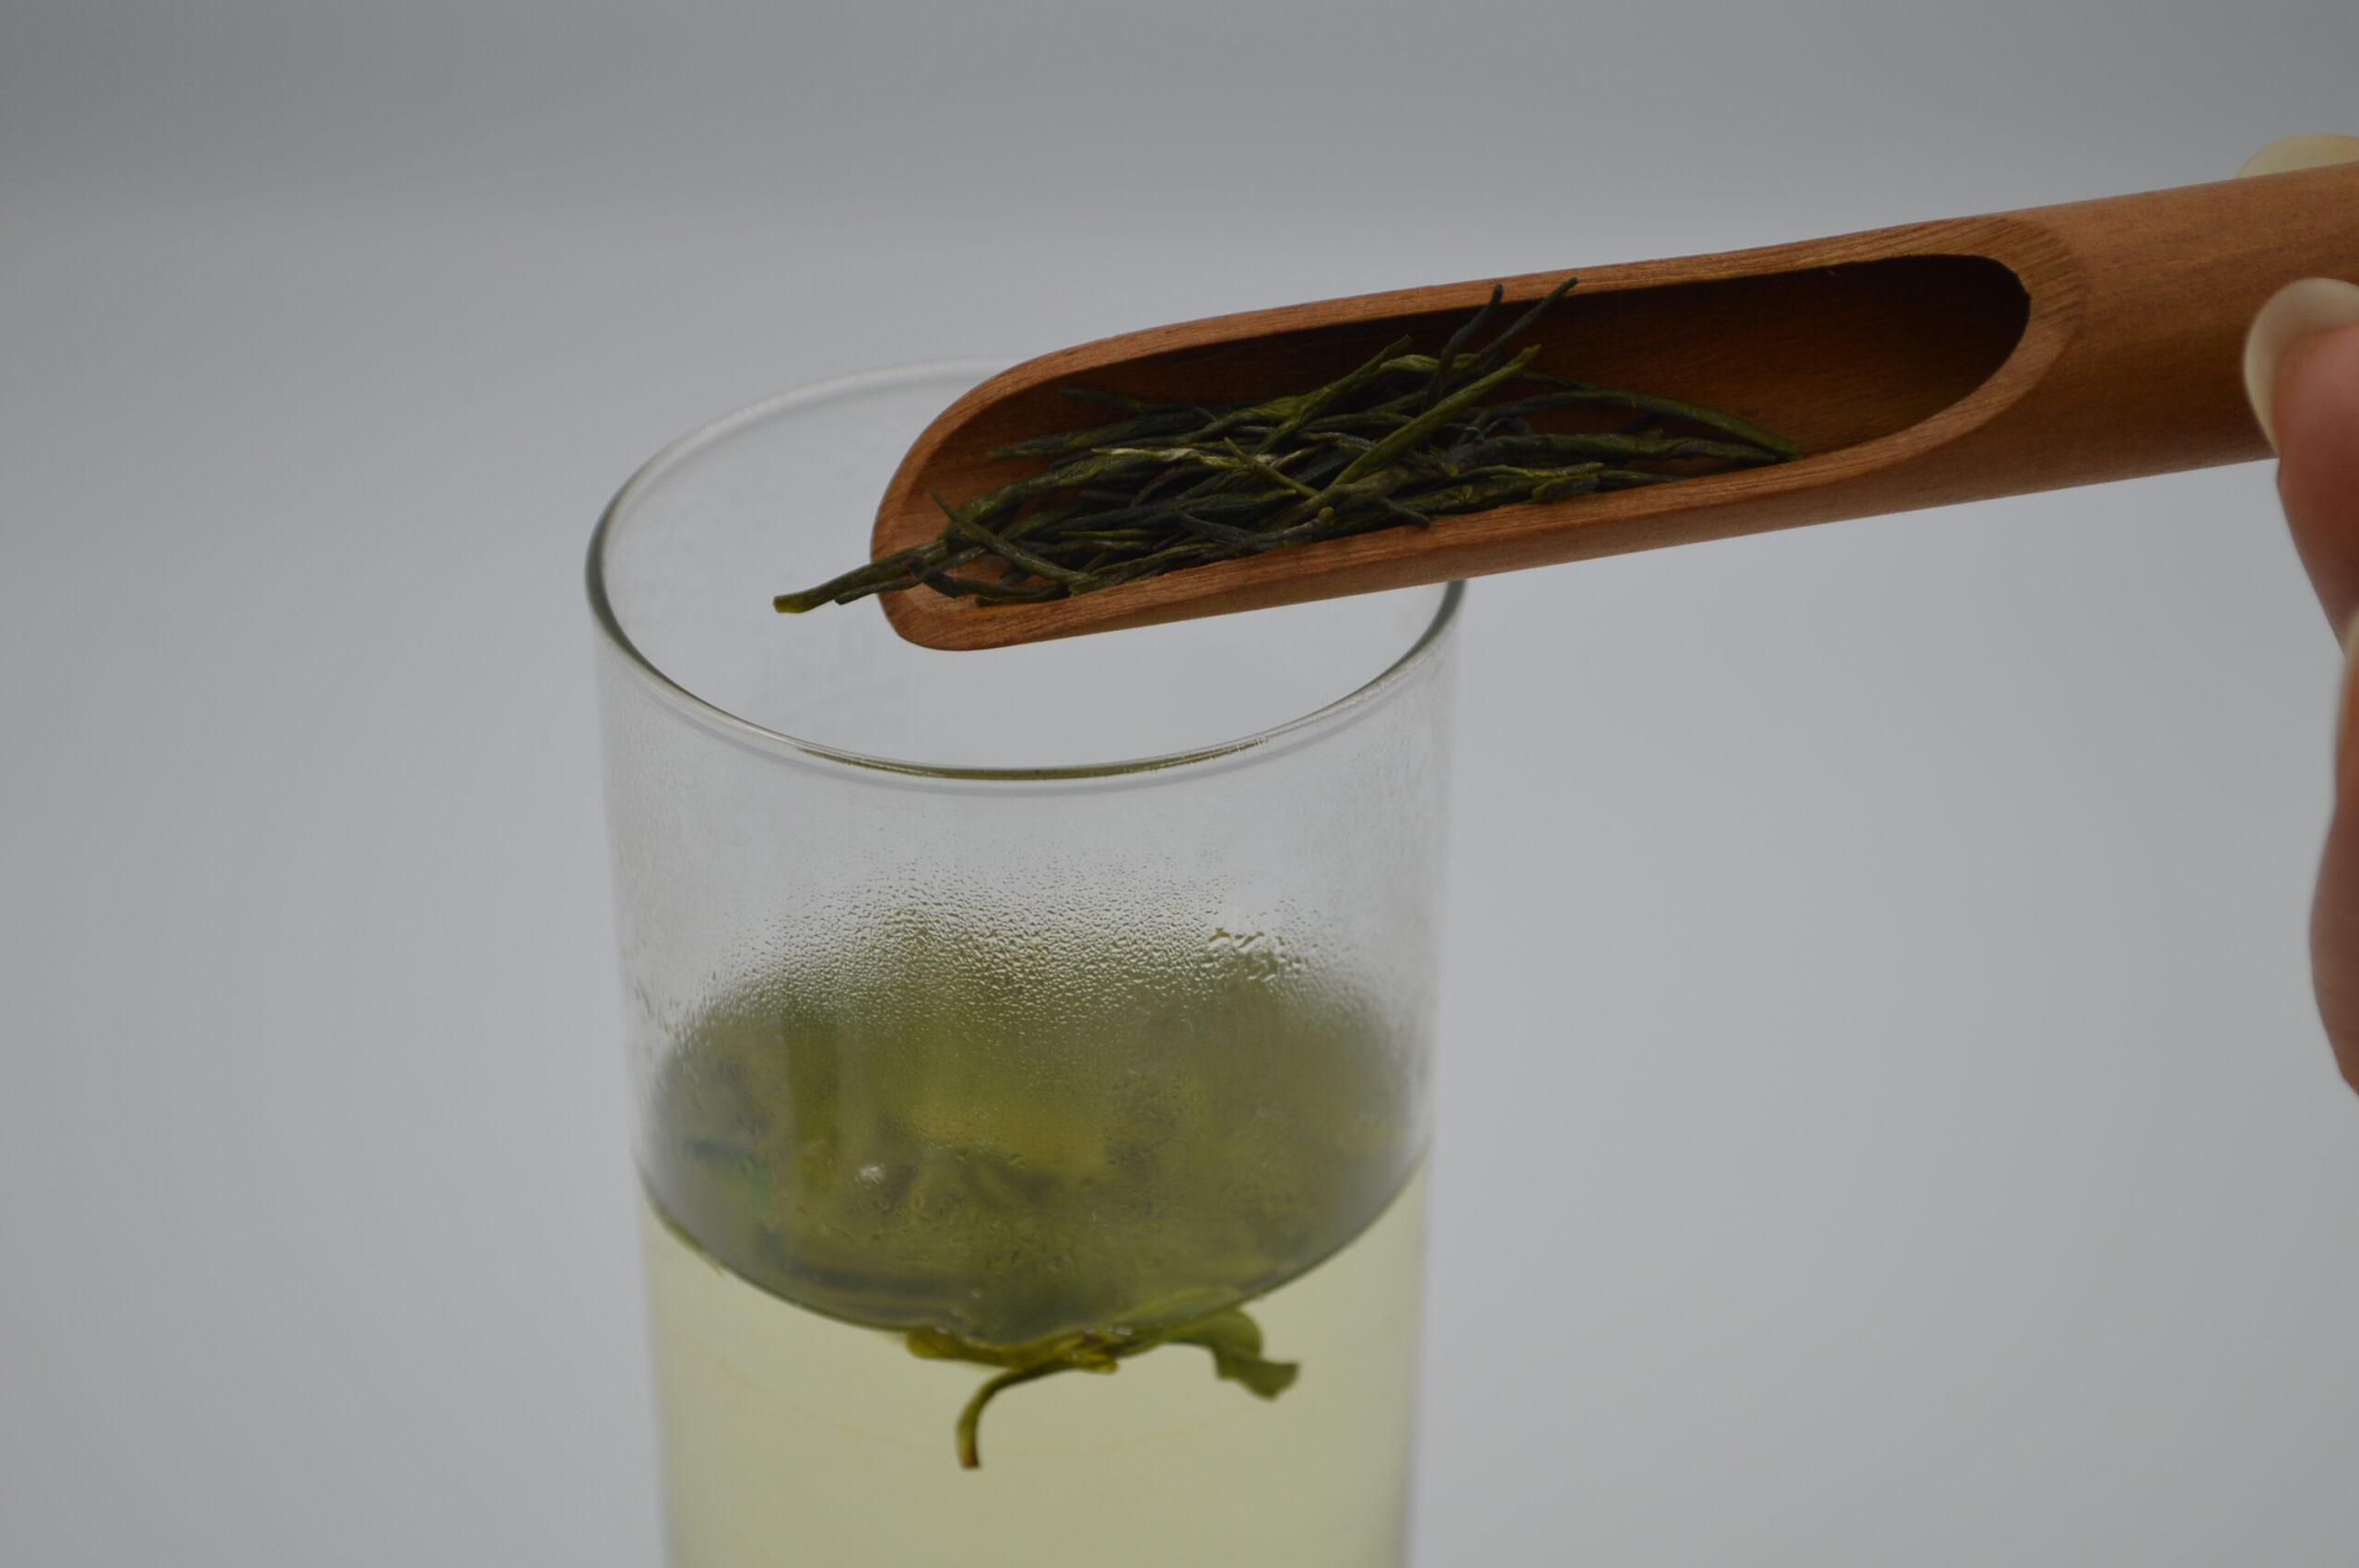 https://shop.liu-tea-art.com/wp-content/uploads/2018/07/DSC_0045-scaled.jpg